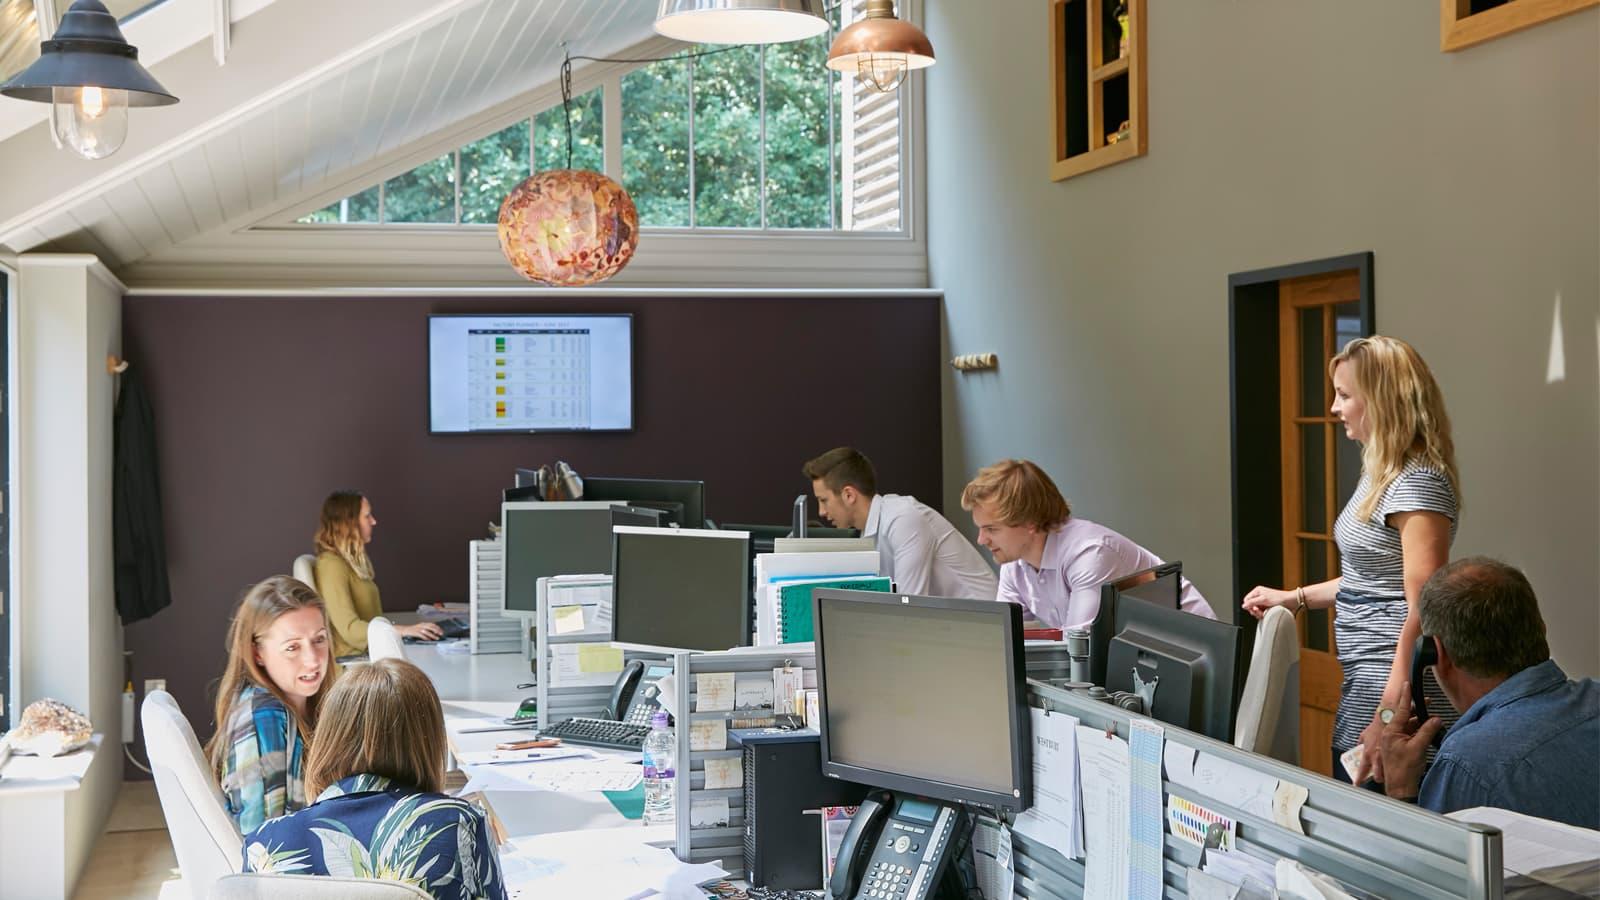 Westbury office garden room filled with staff